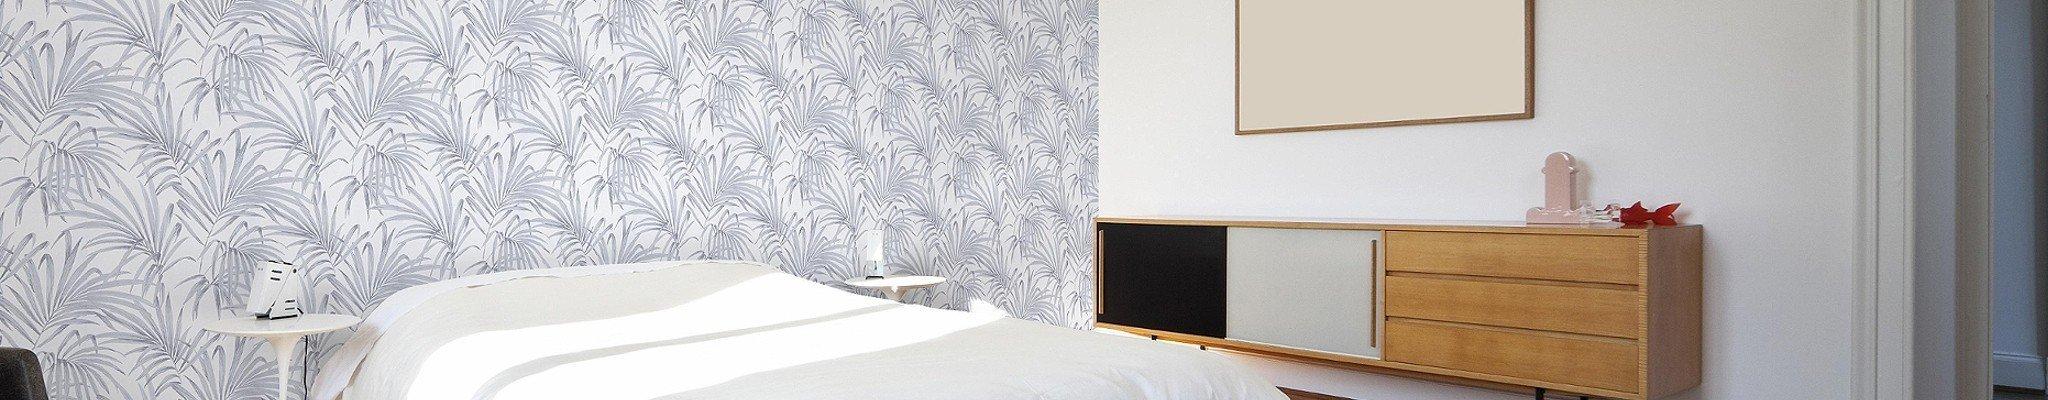 octopus pop cat florale muster tapeten lust auf was. Black Bedroom Furniture Sets. Home Design Ideas